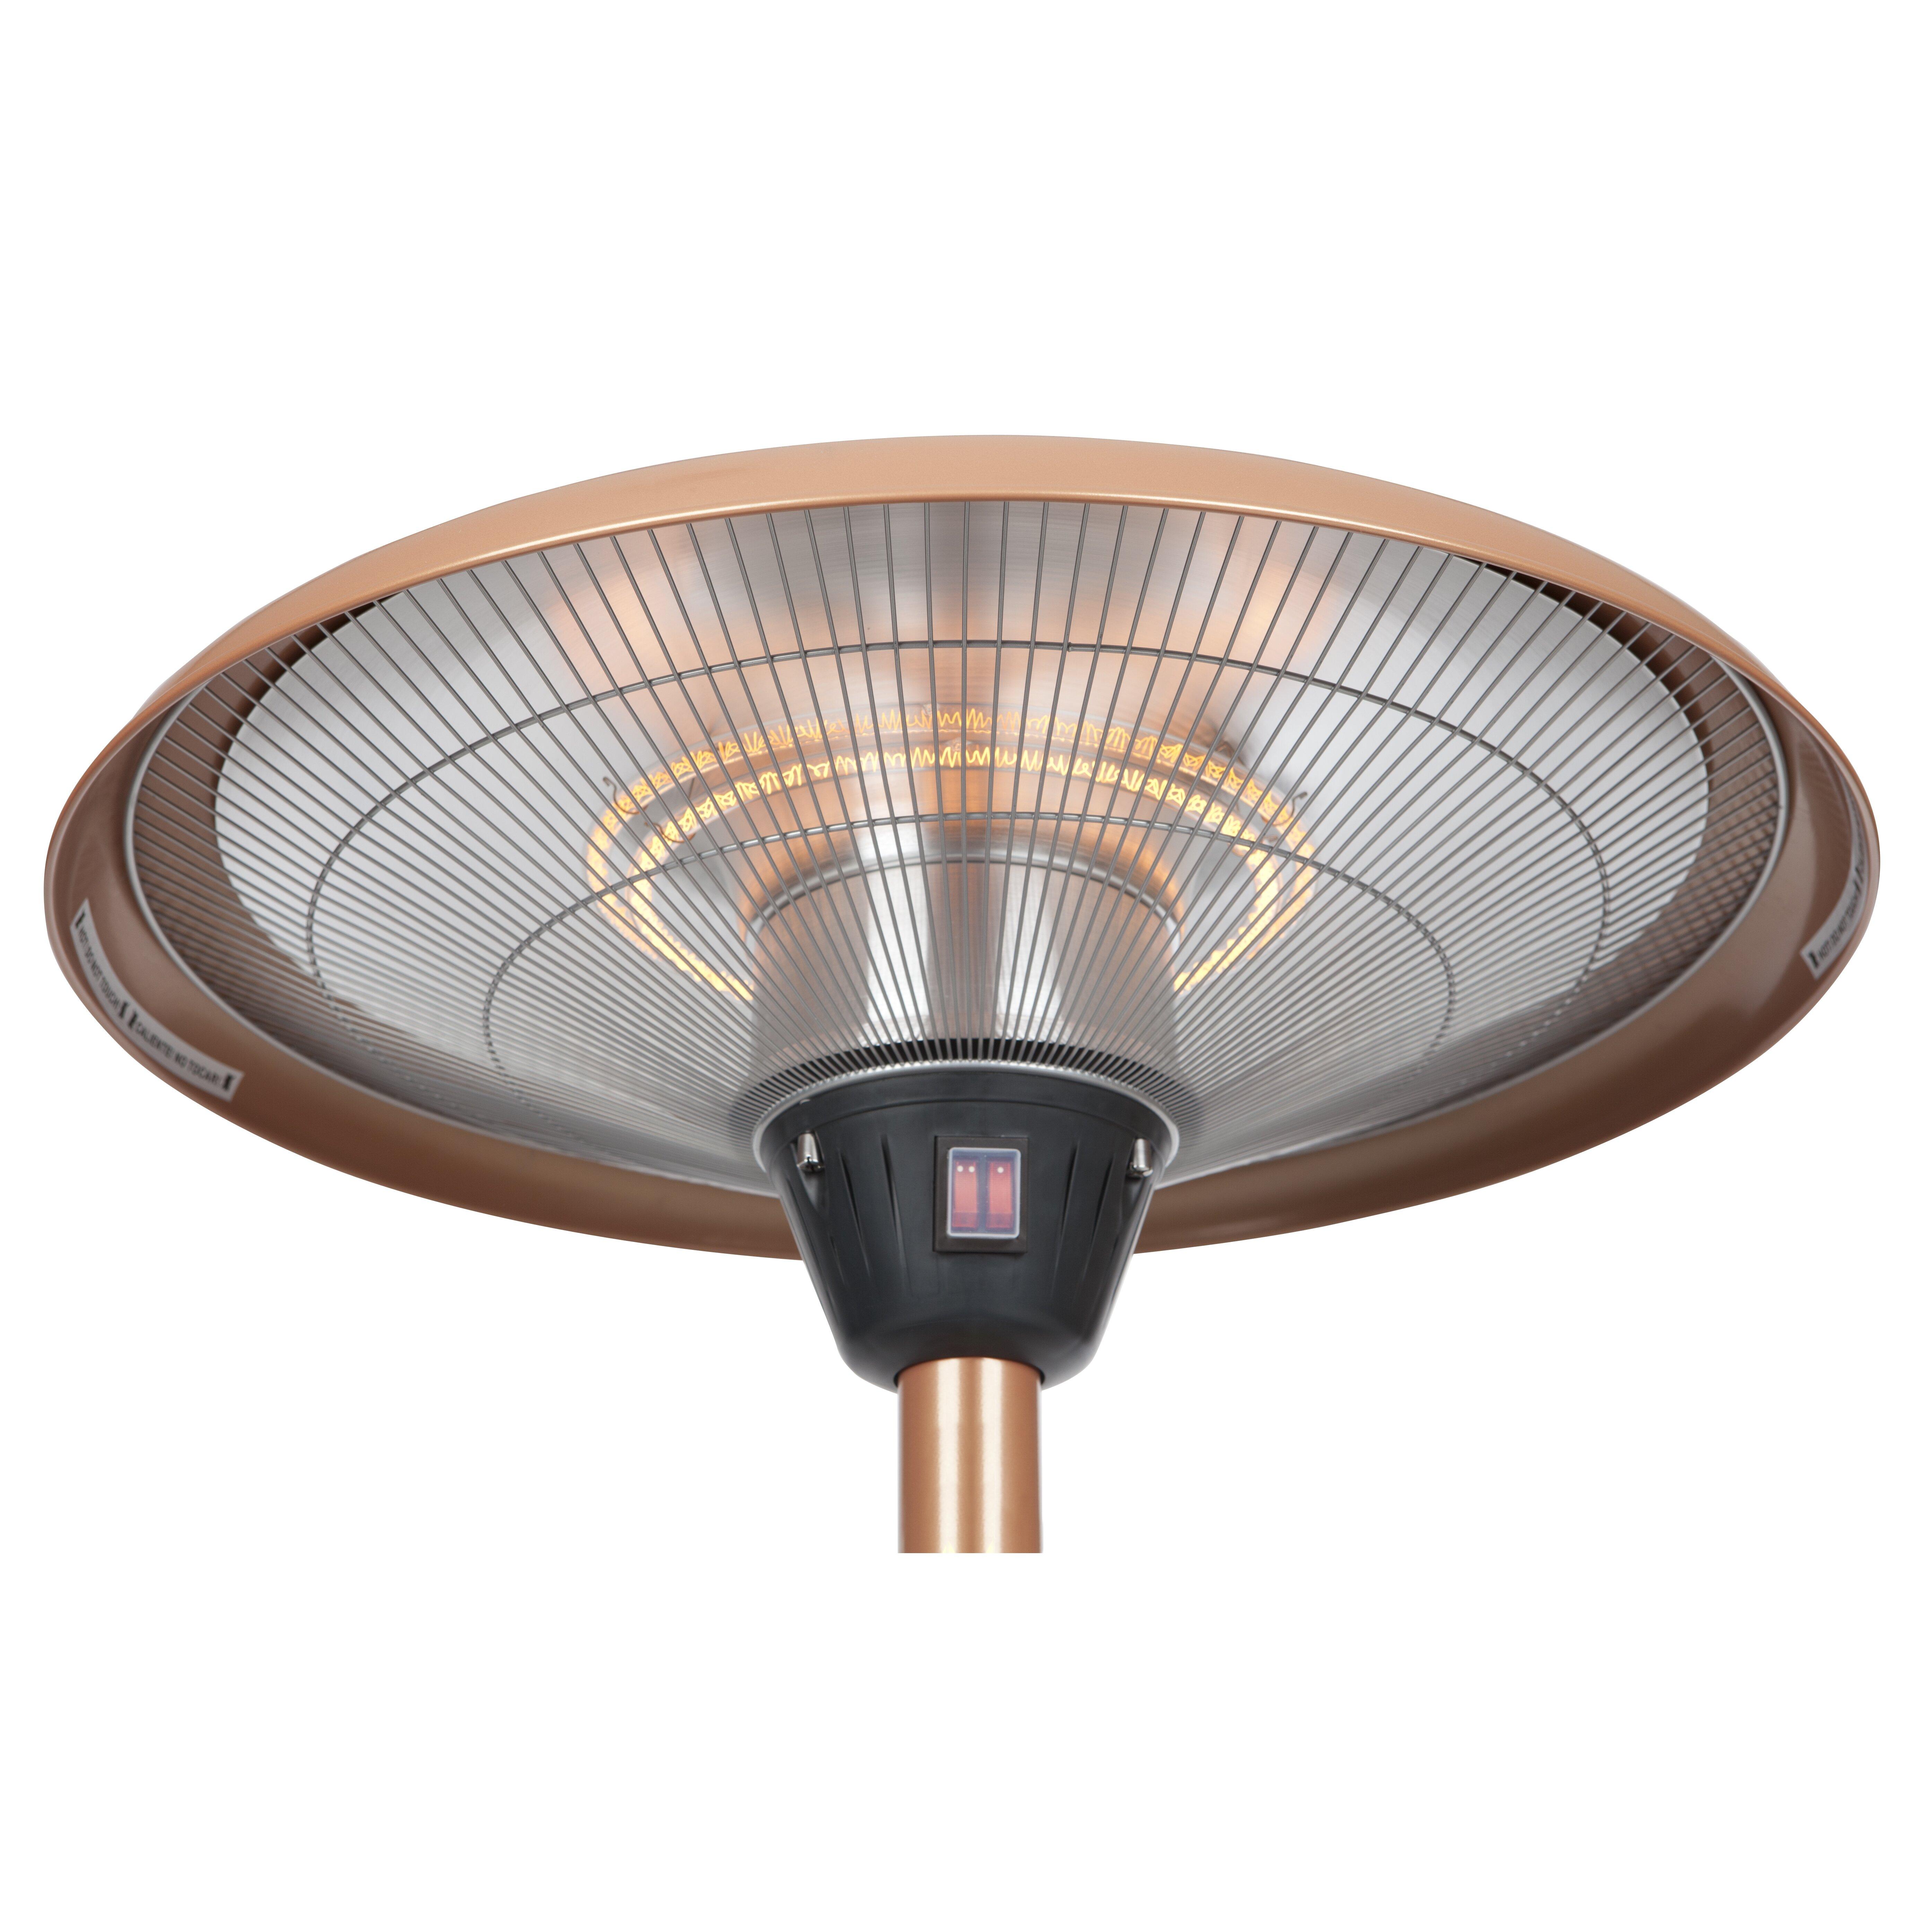 Outdoor Heating  Electric Patio Heaters Fire Sense SKU: FRS1176